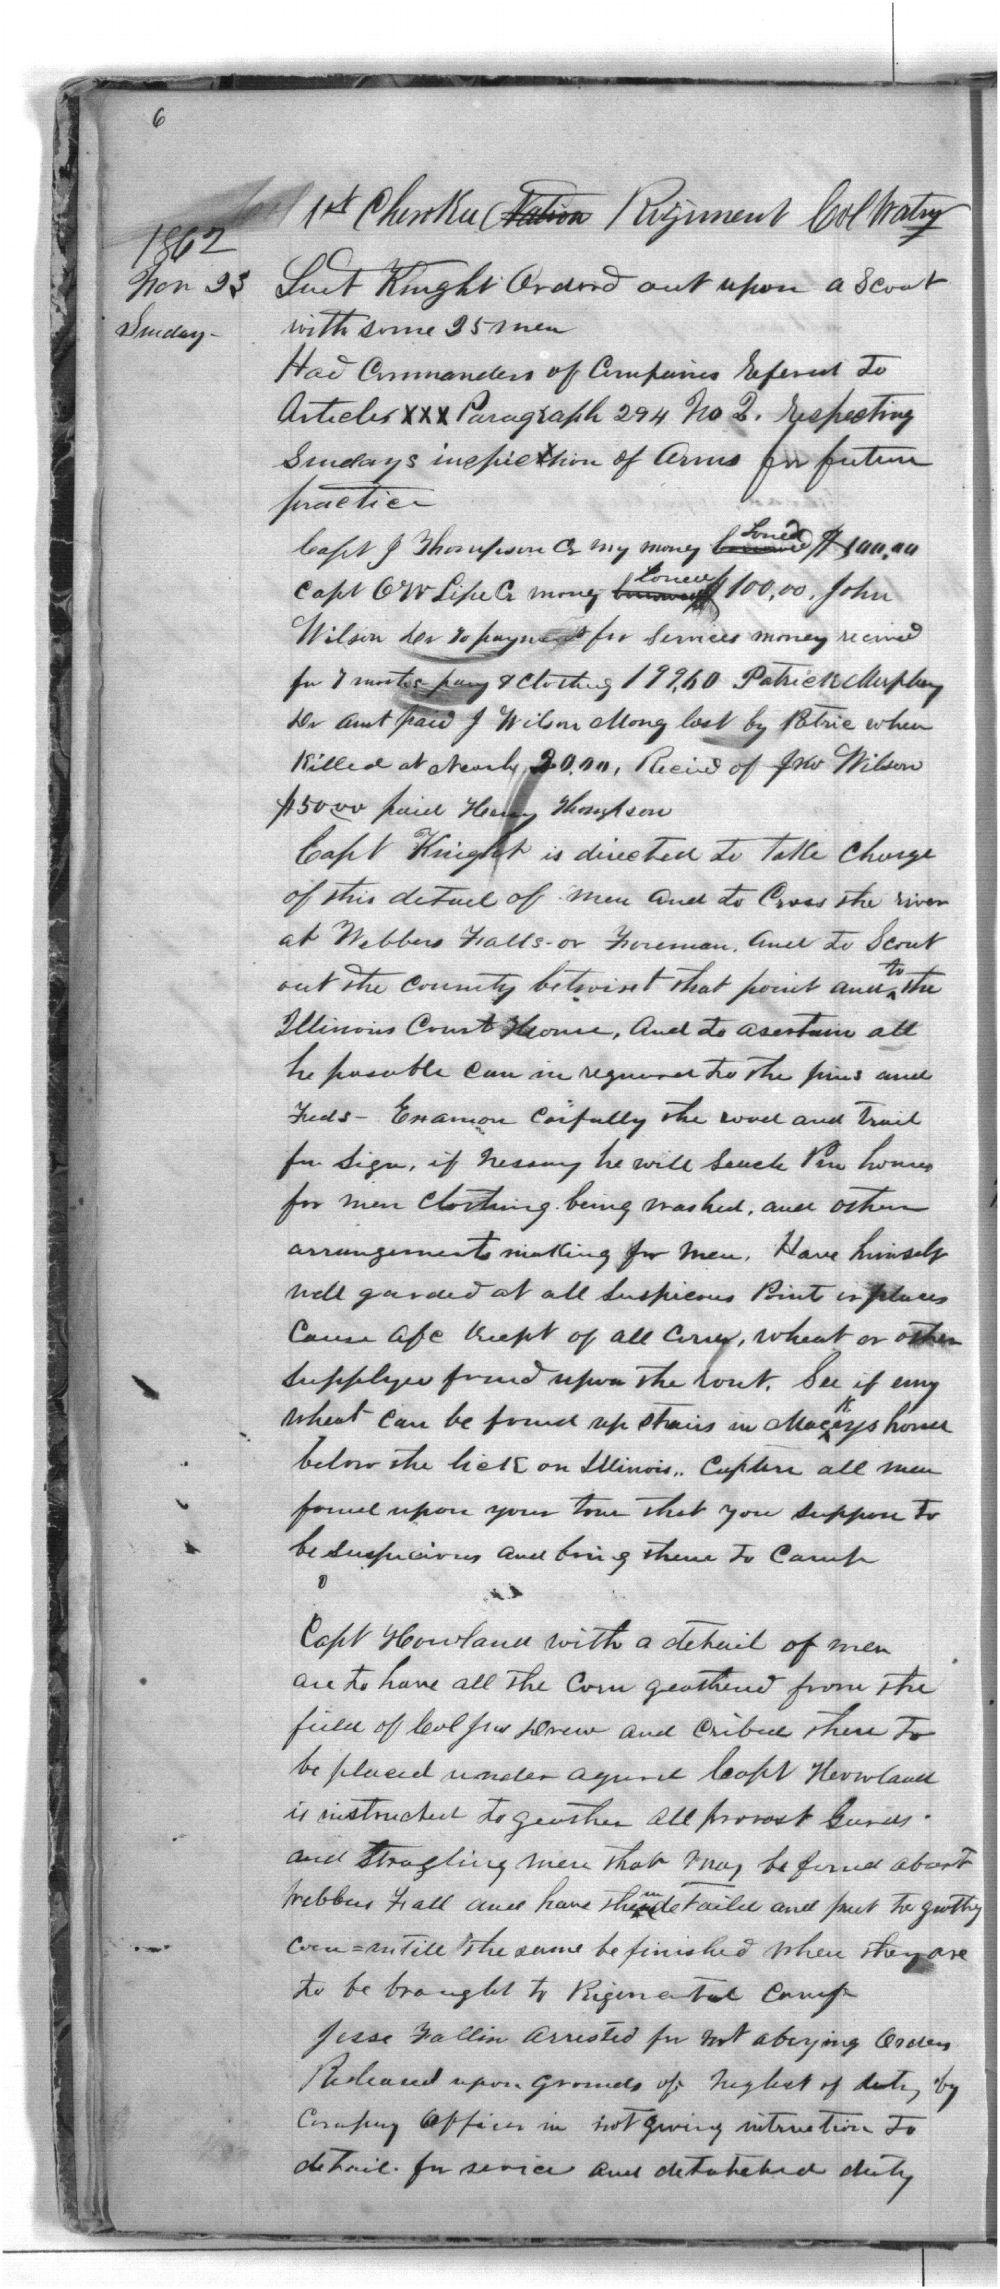 First Cherokee Regiment day book - 6